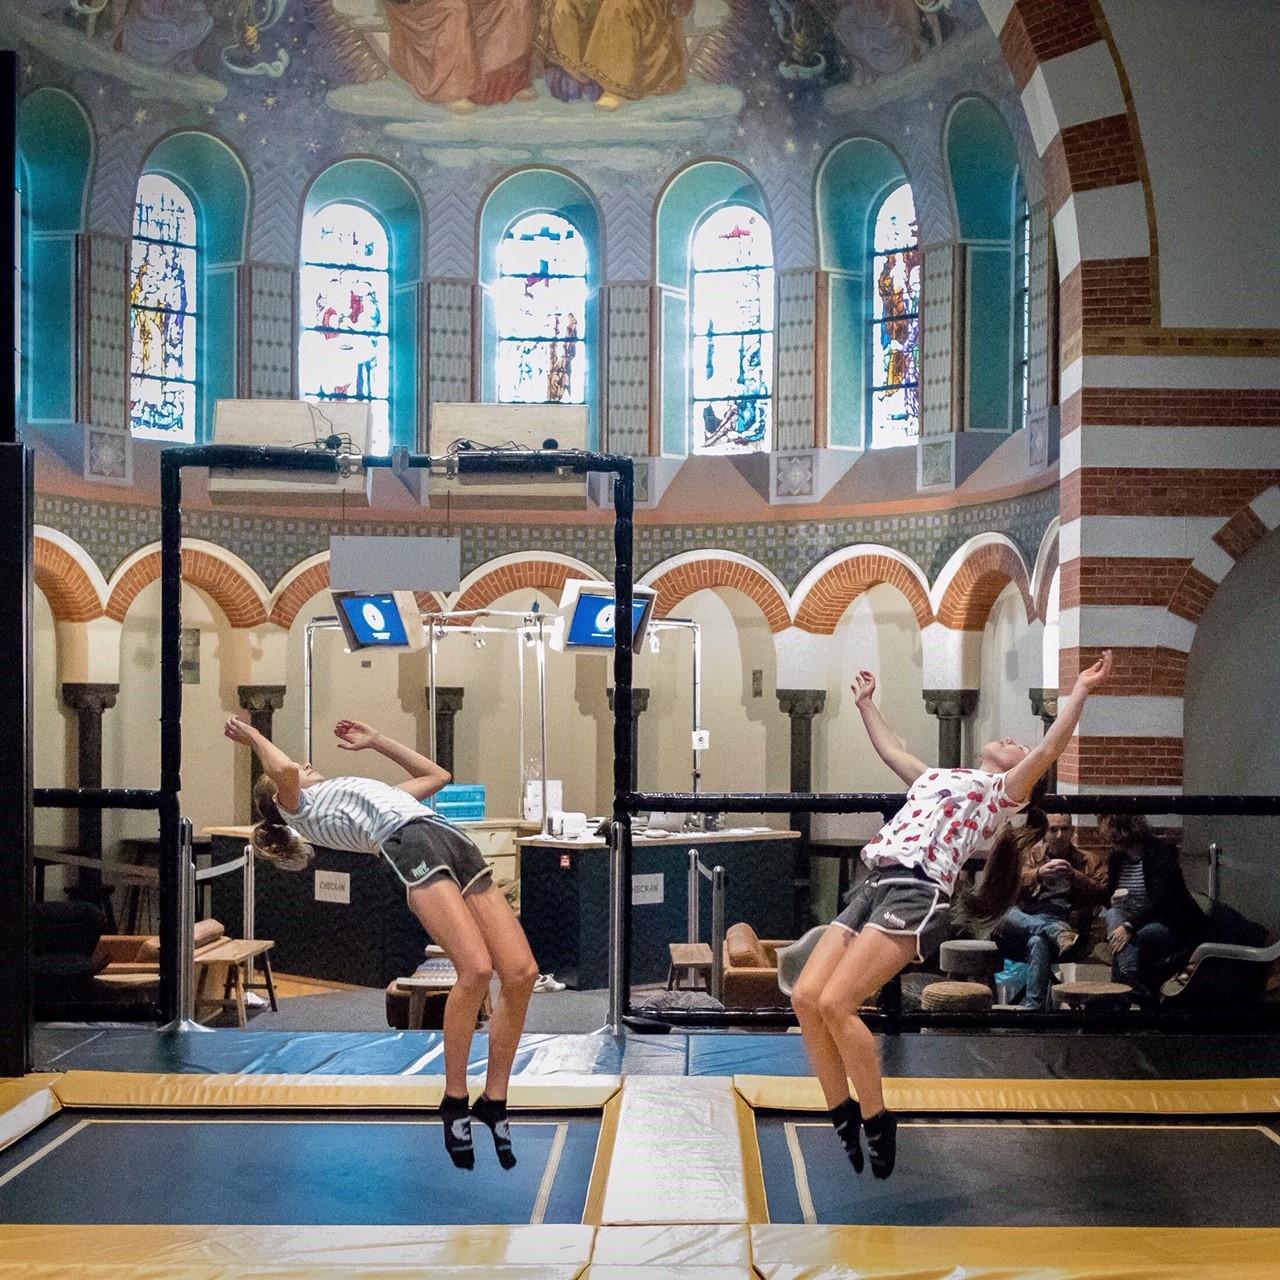 Friday Flipout dubbel backflip op de trampolines bij Flight Deck 53 trampolinepark in Hilversum